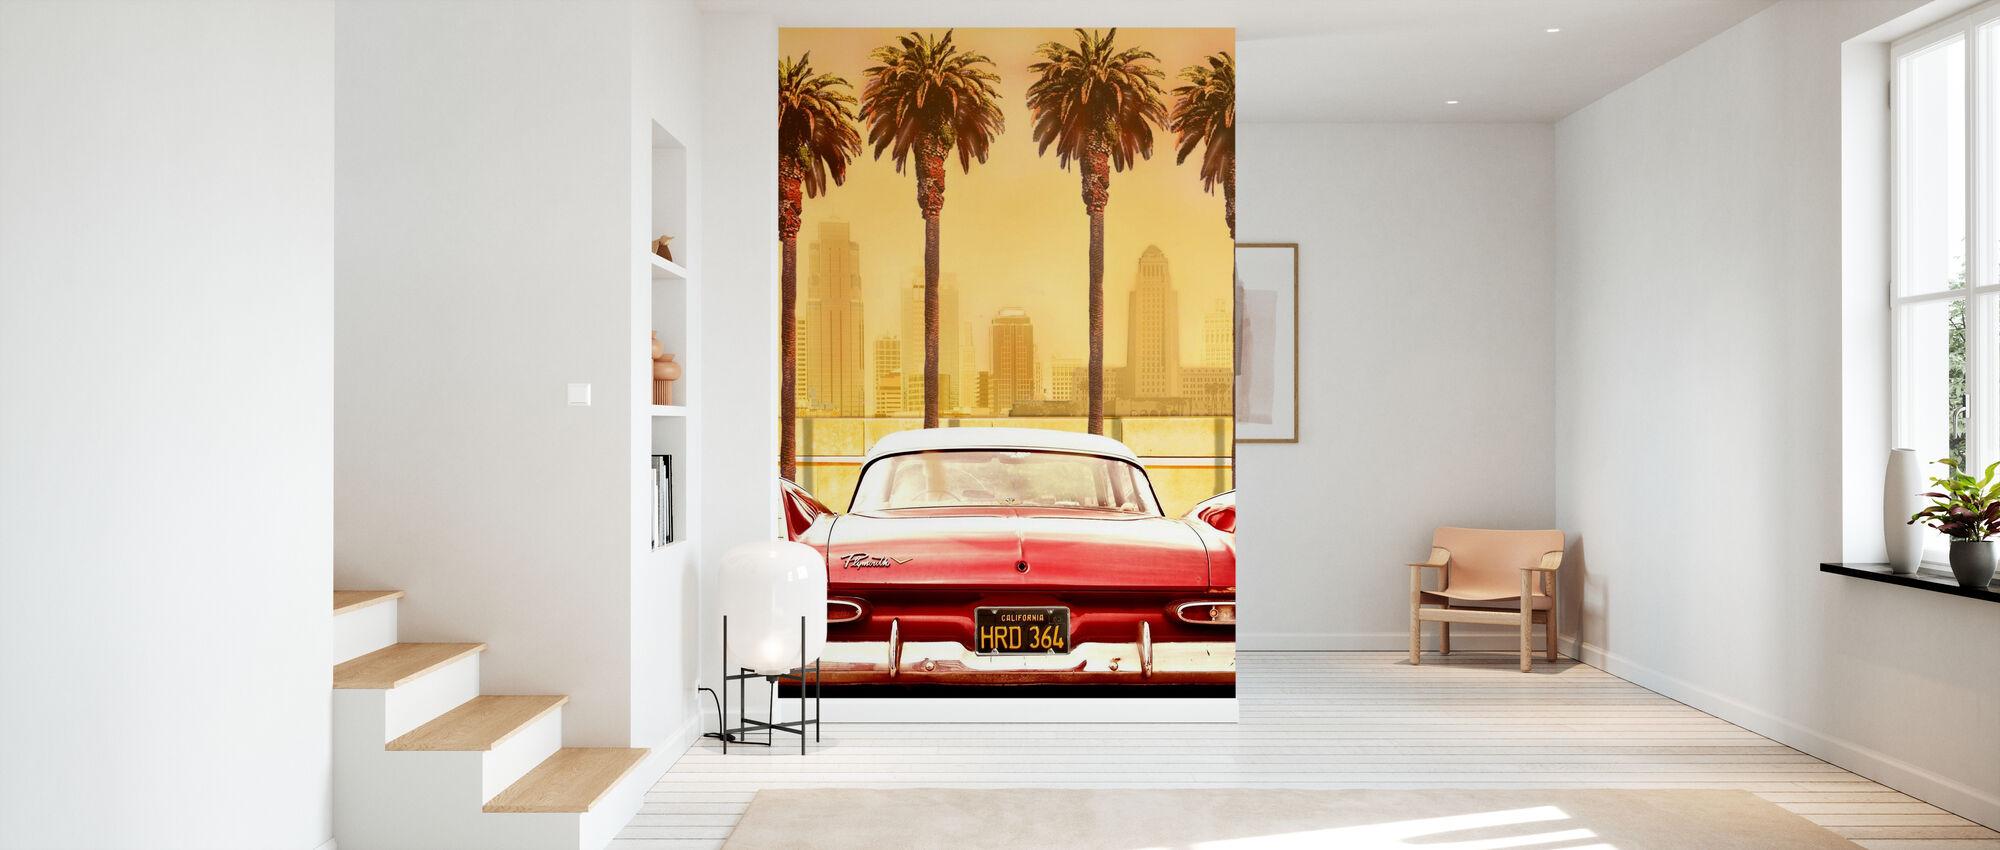 Plymouth Savoy med palmer - Tapet - Hall